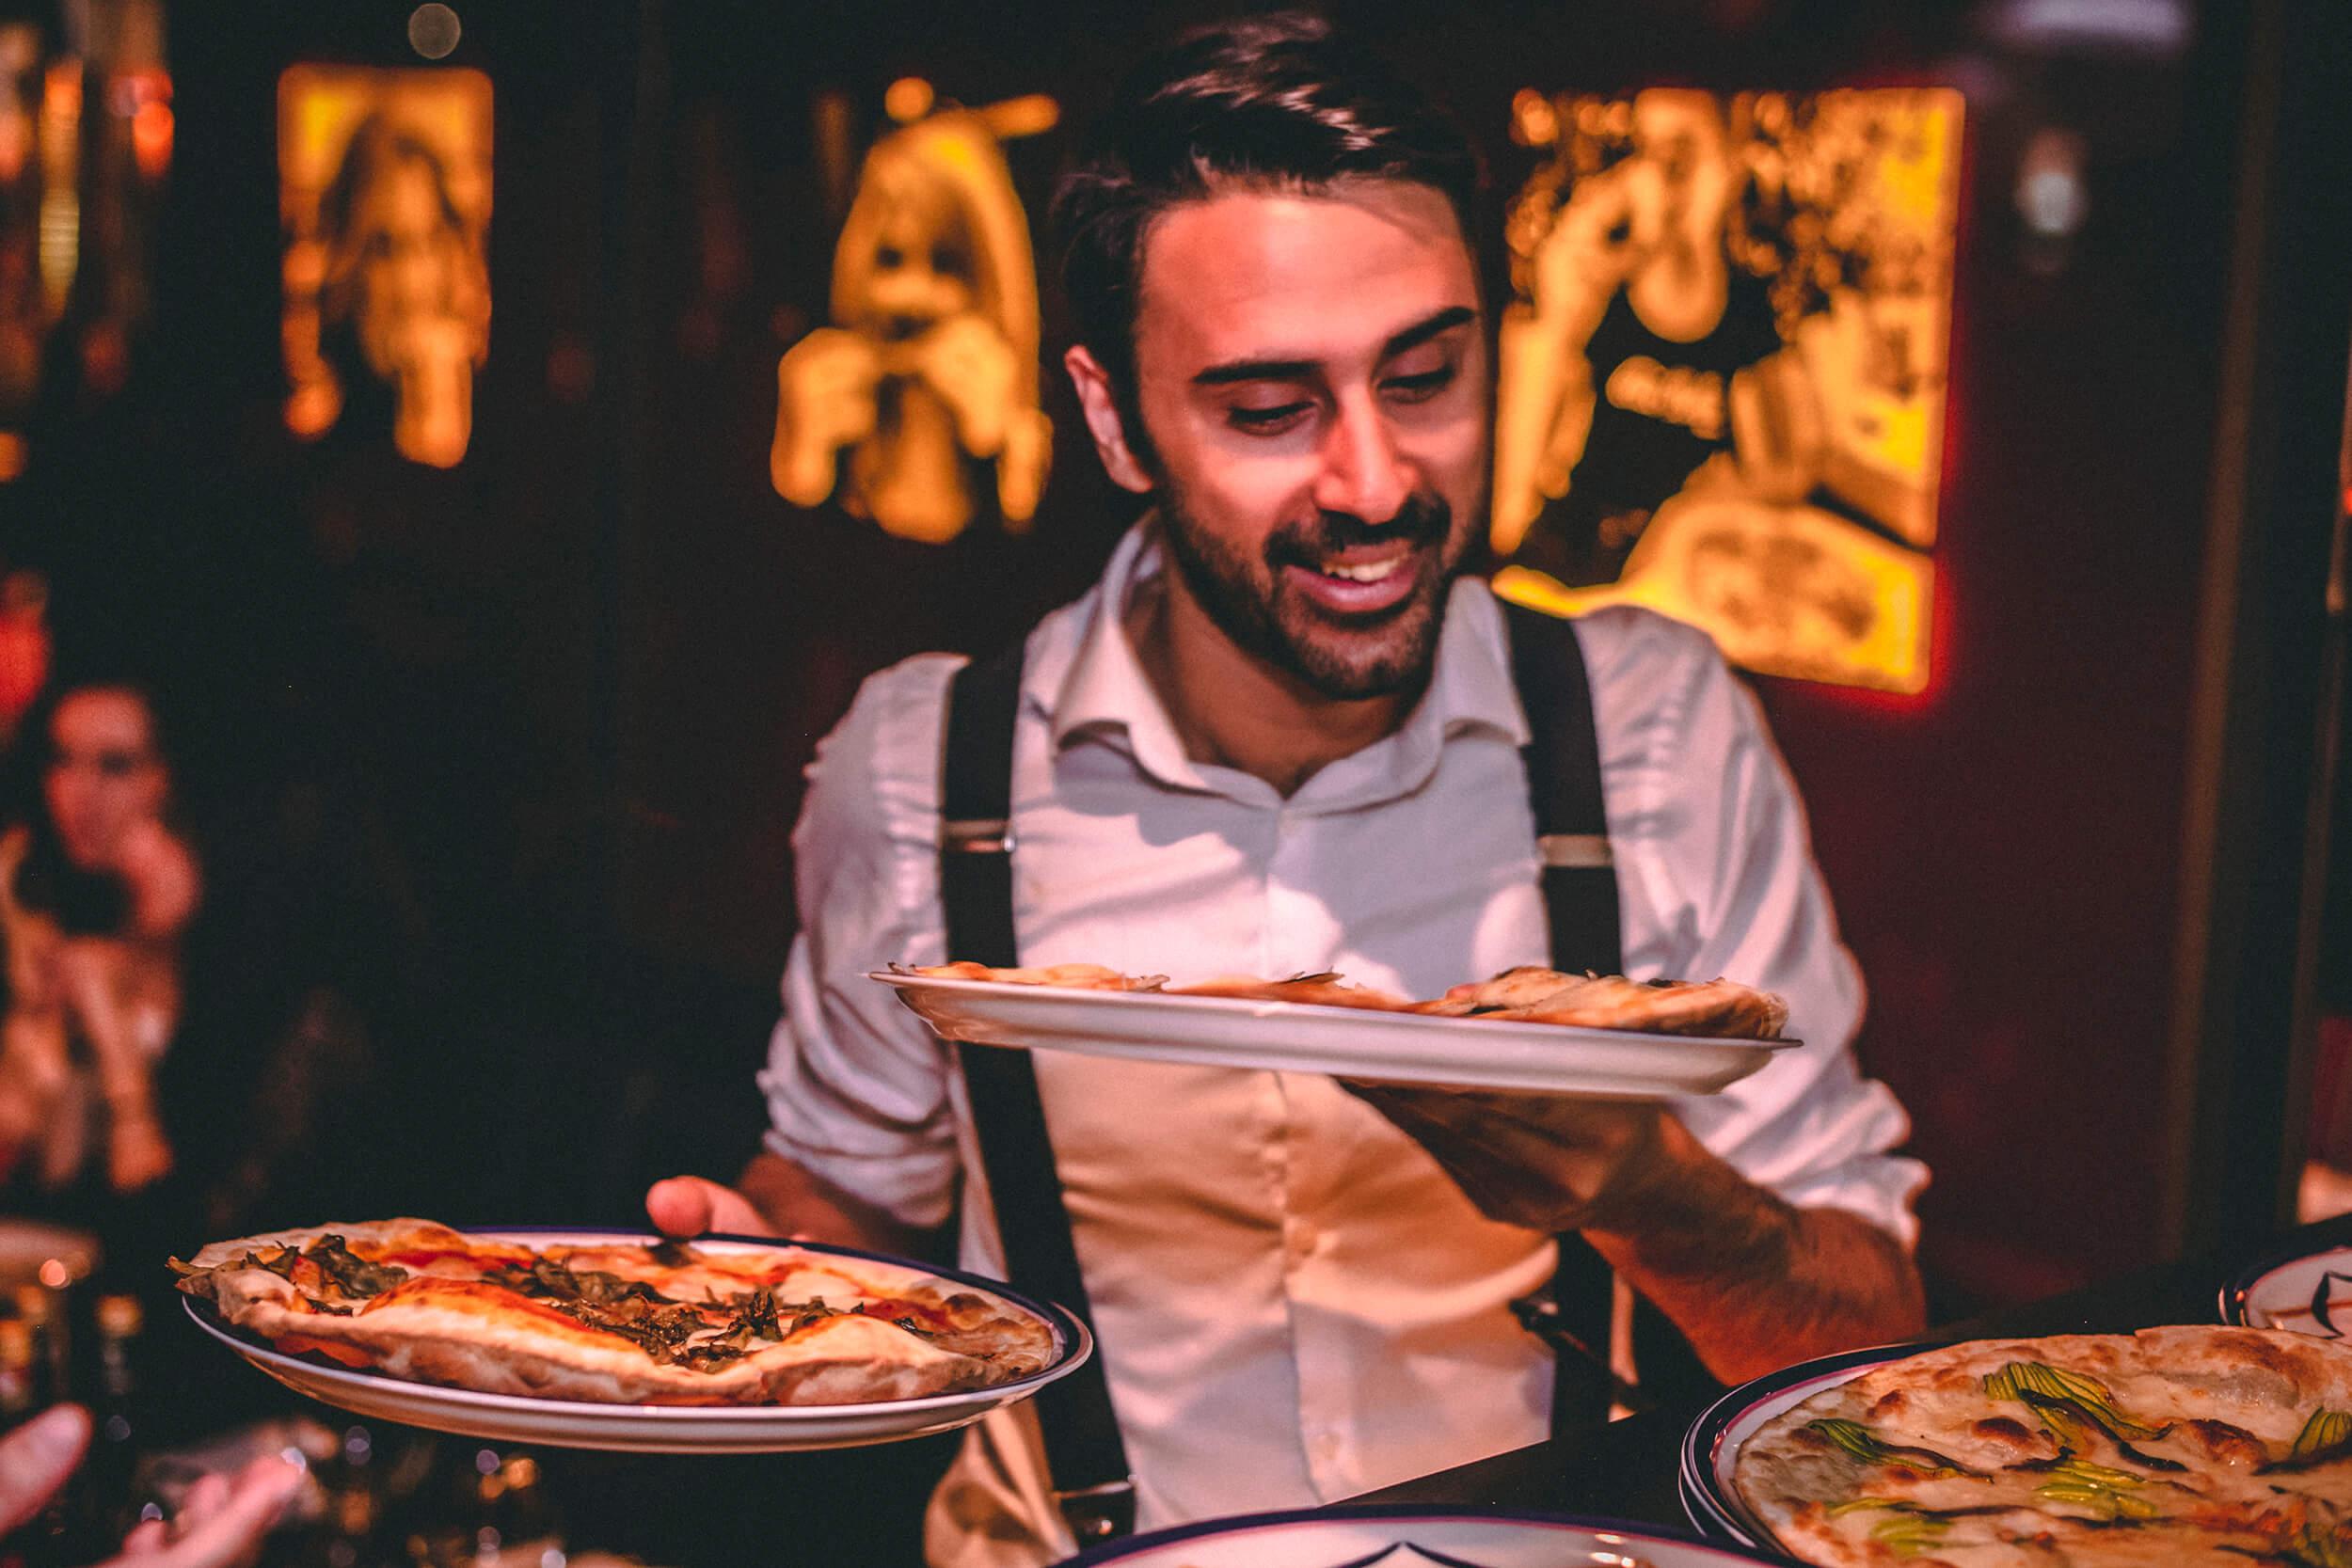 Waiter serving fresh pizza.